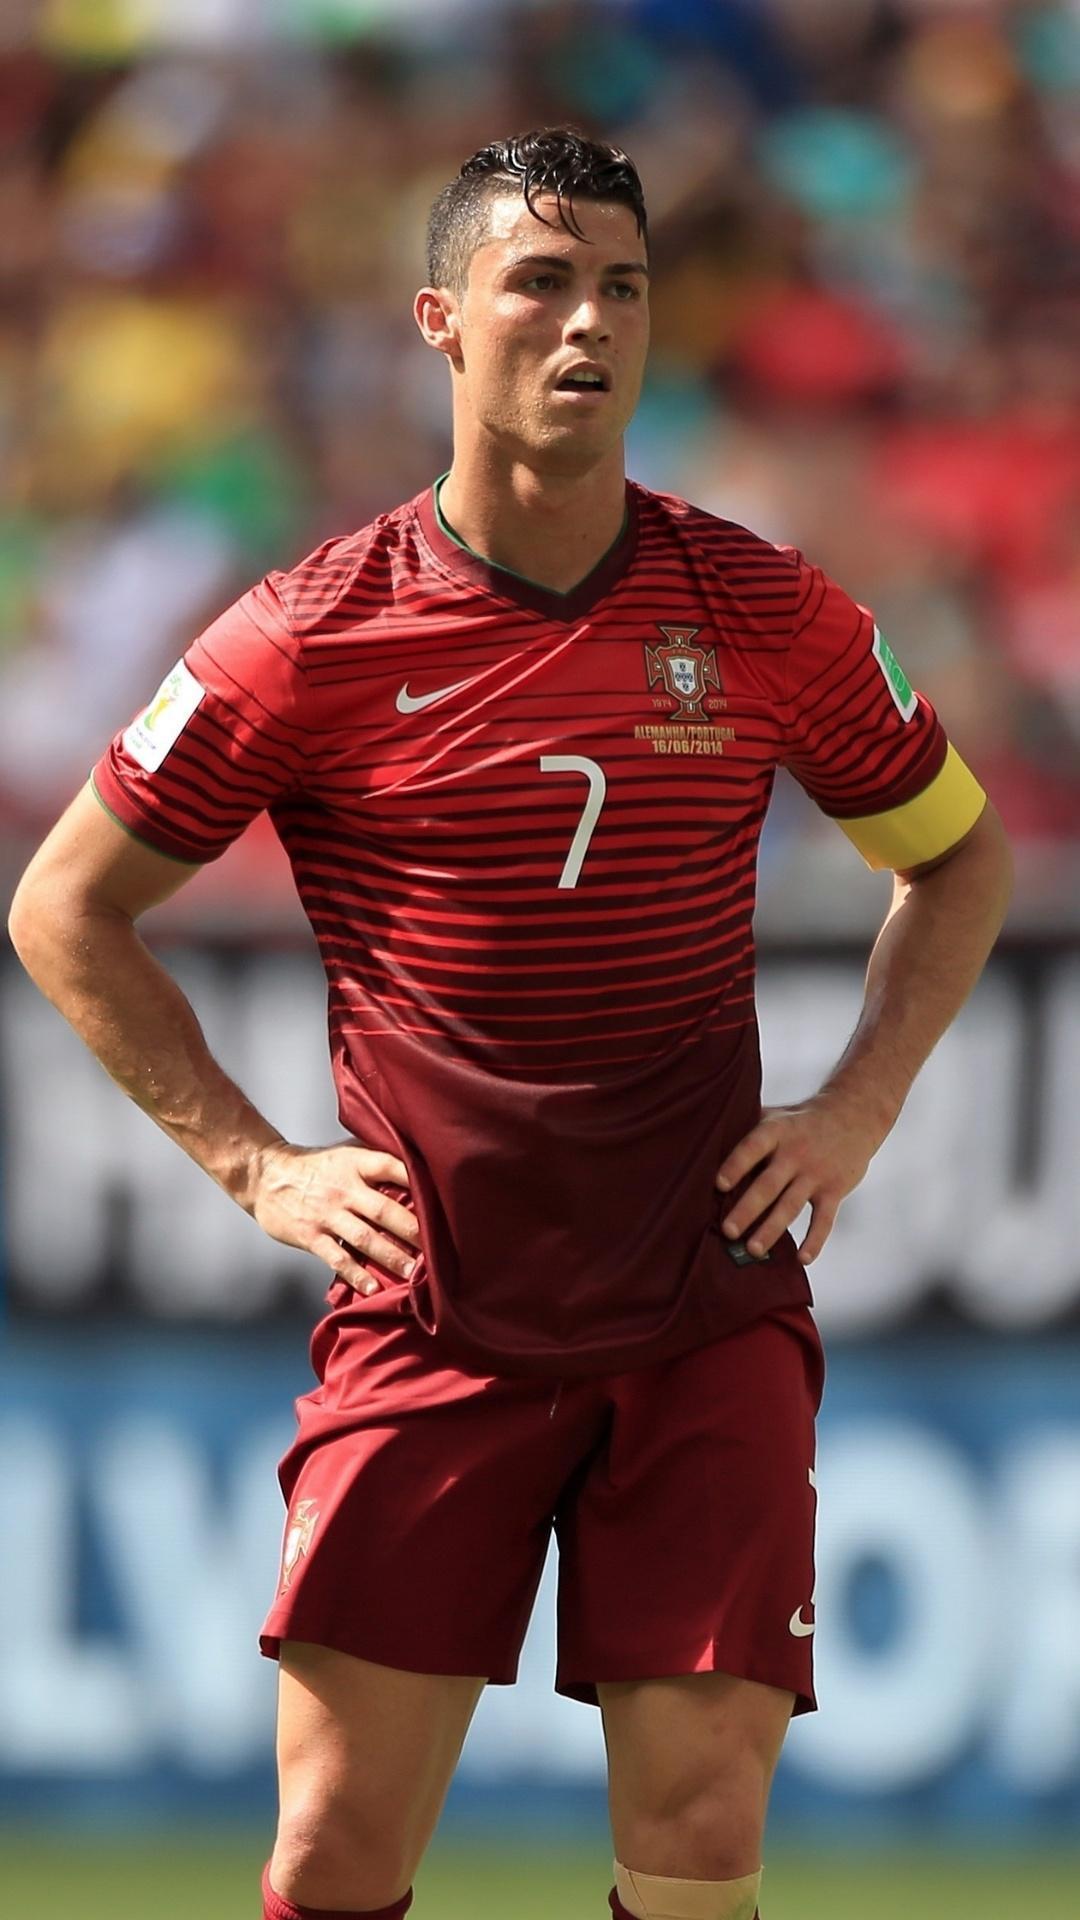 Cristiano Ronaldo 2019 Wallpapers - Wallpaper Cave